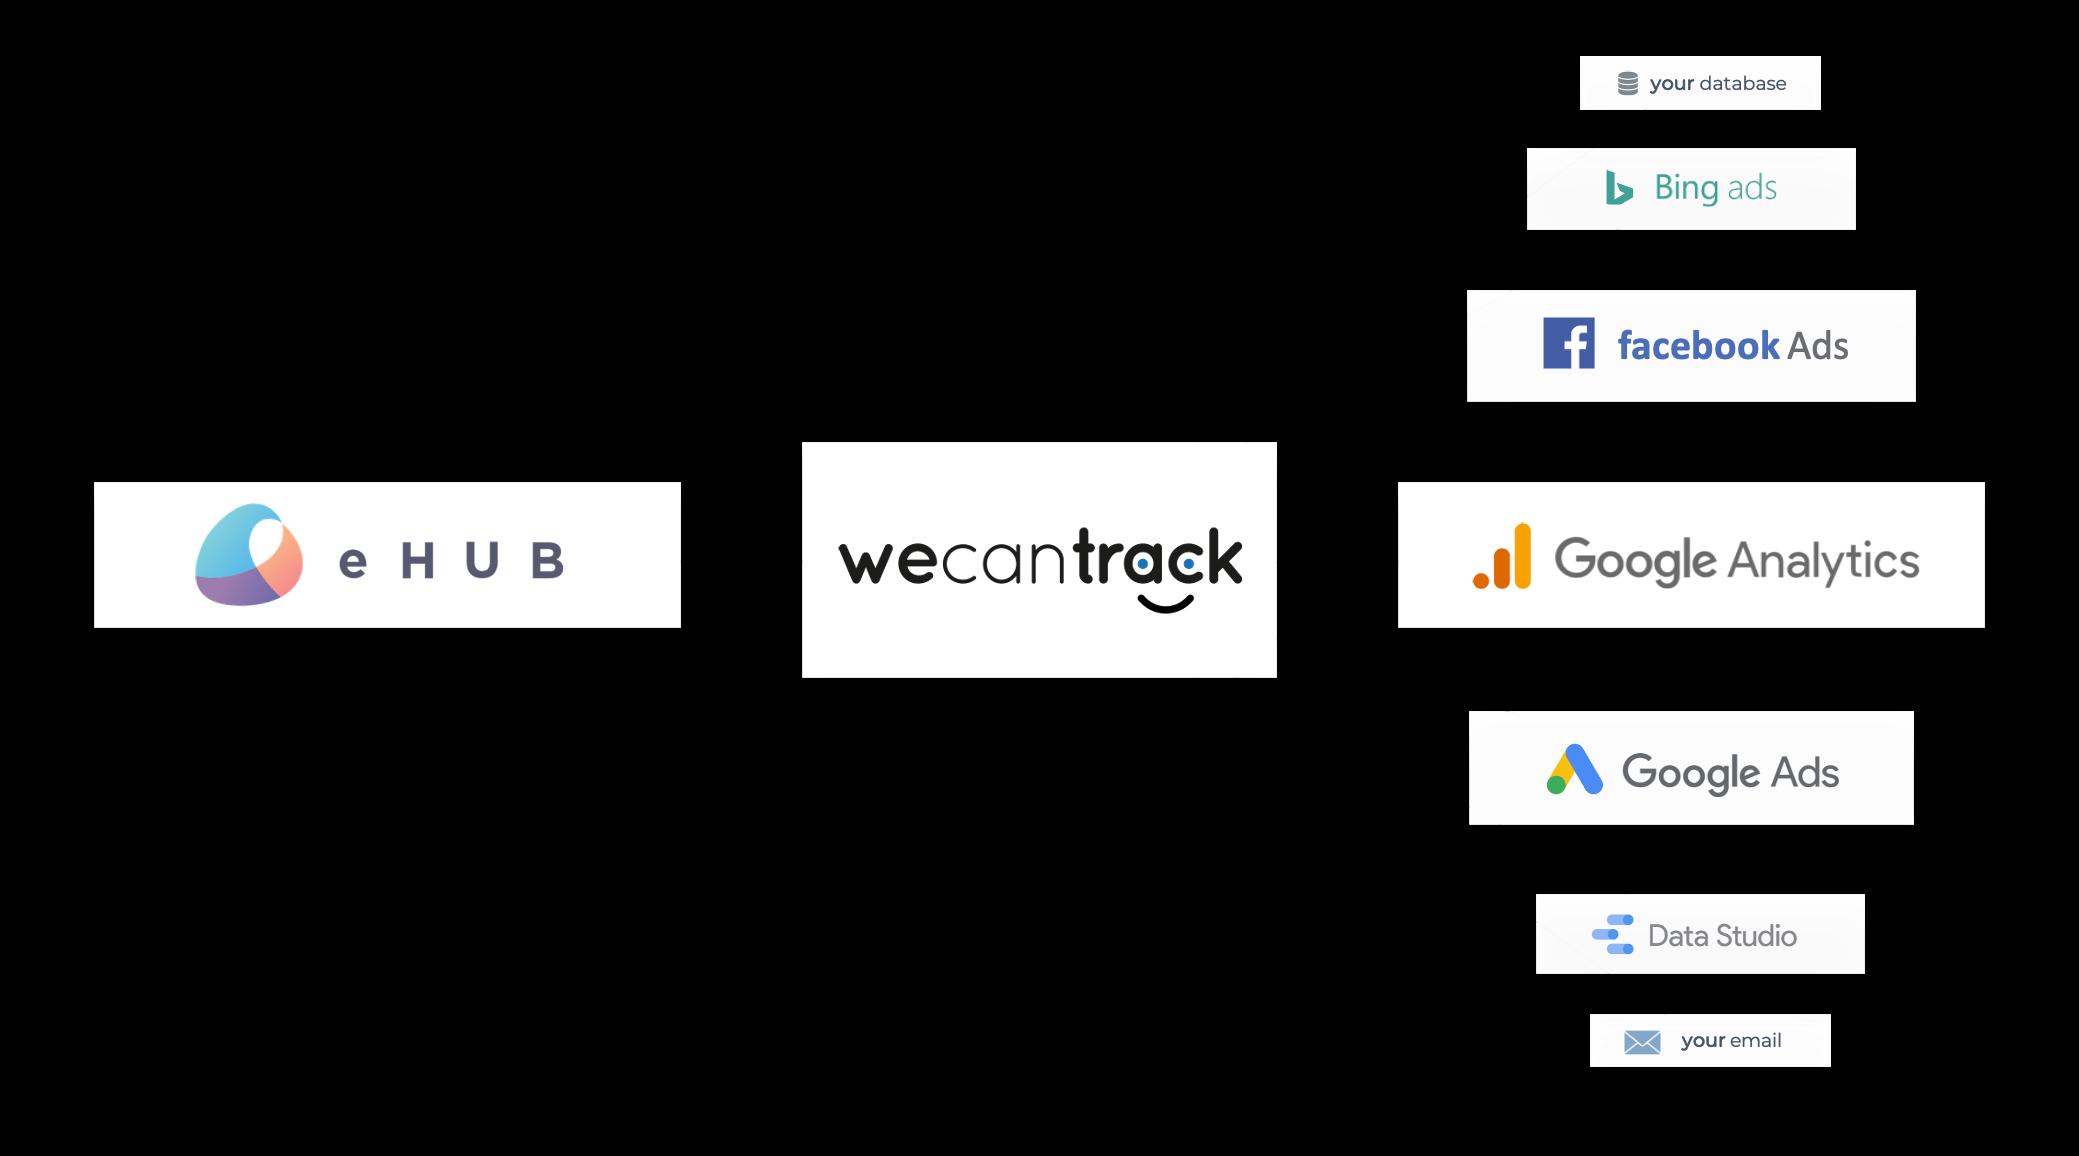 ehub-affiliate-conversion-data-integration-via-api